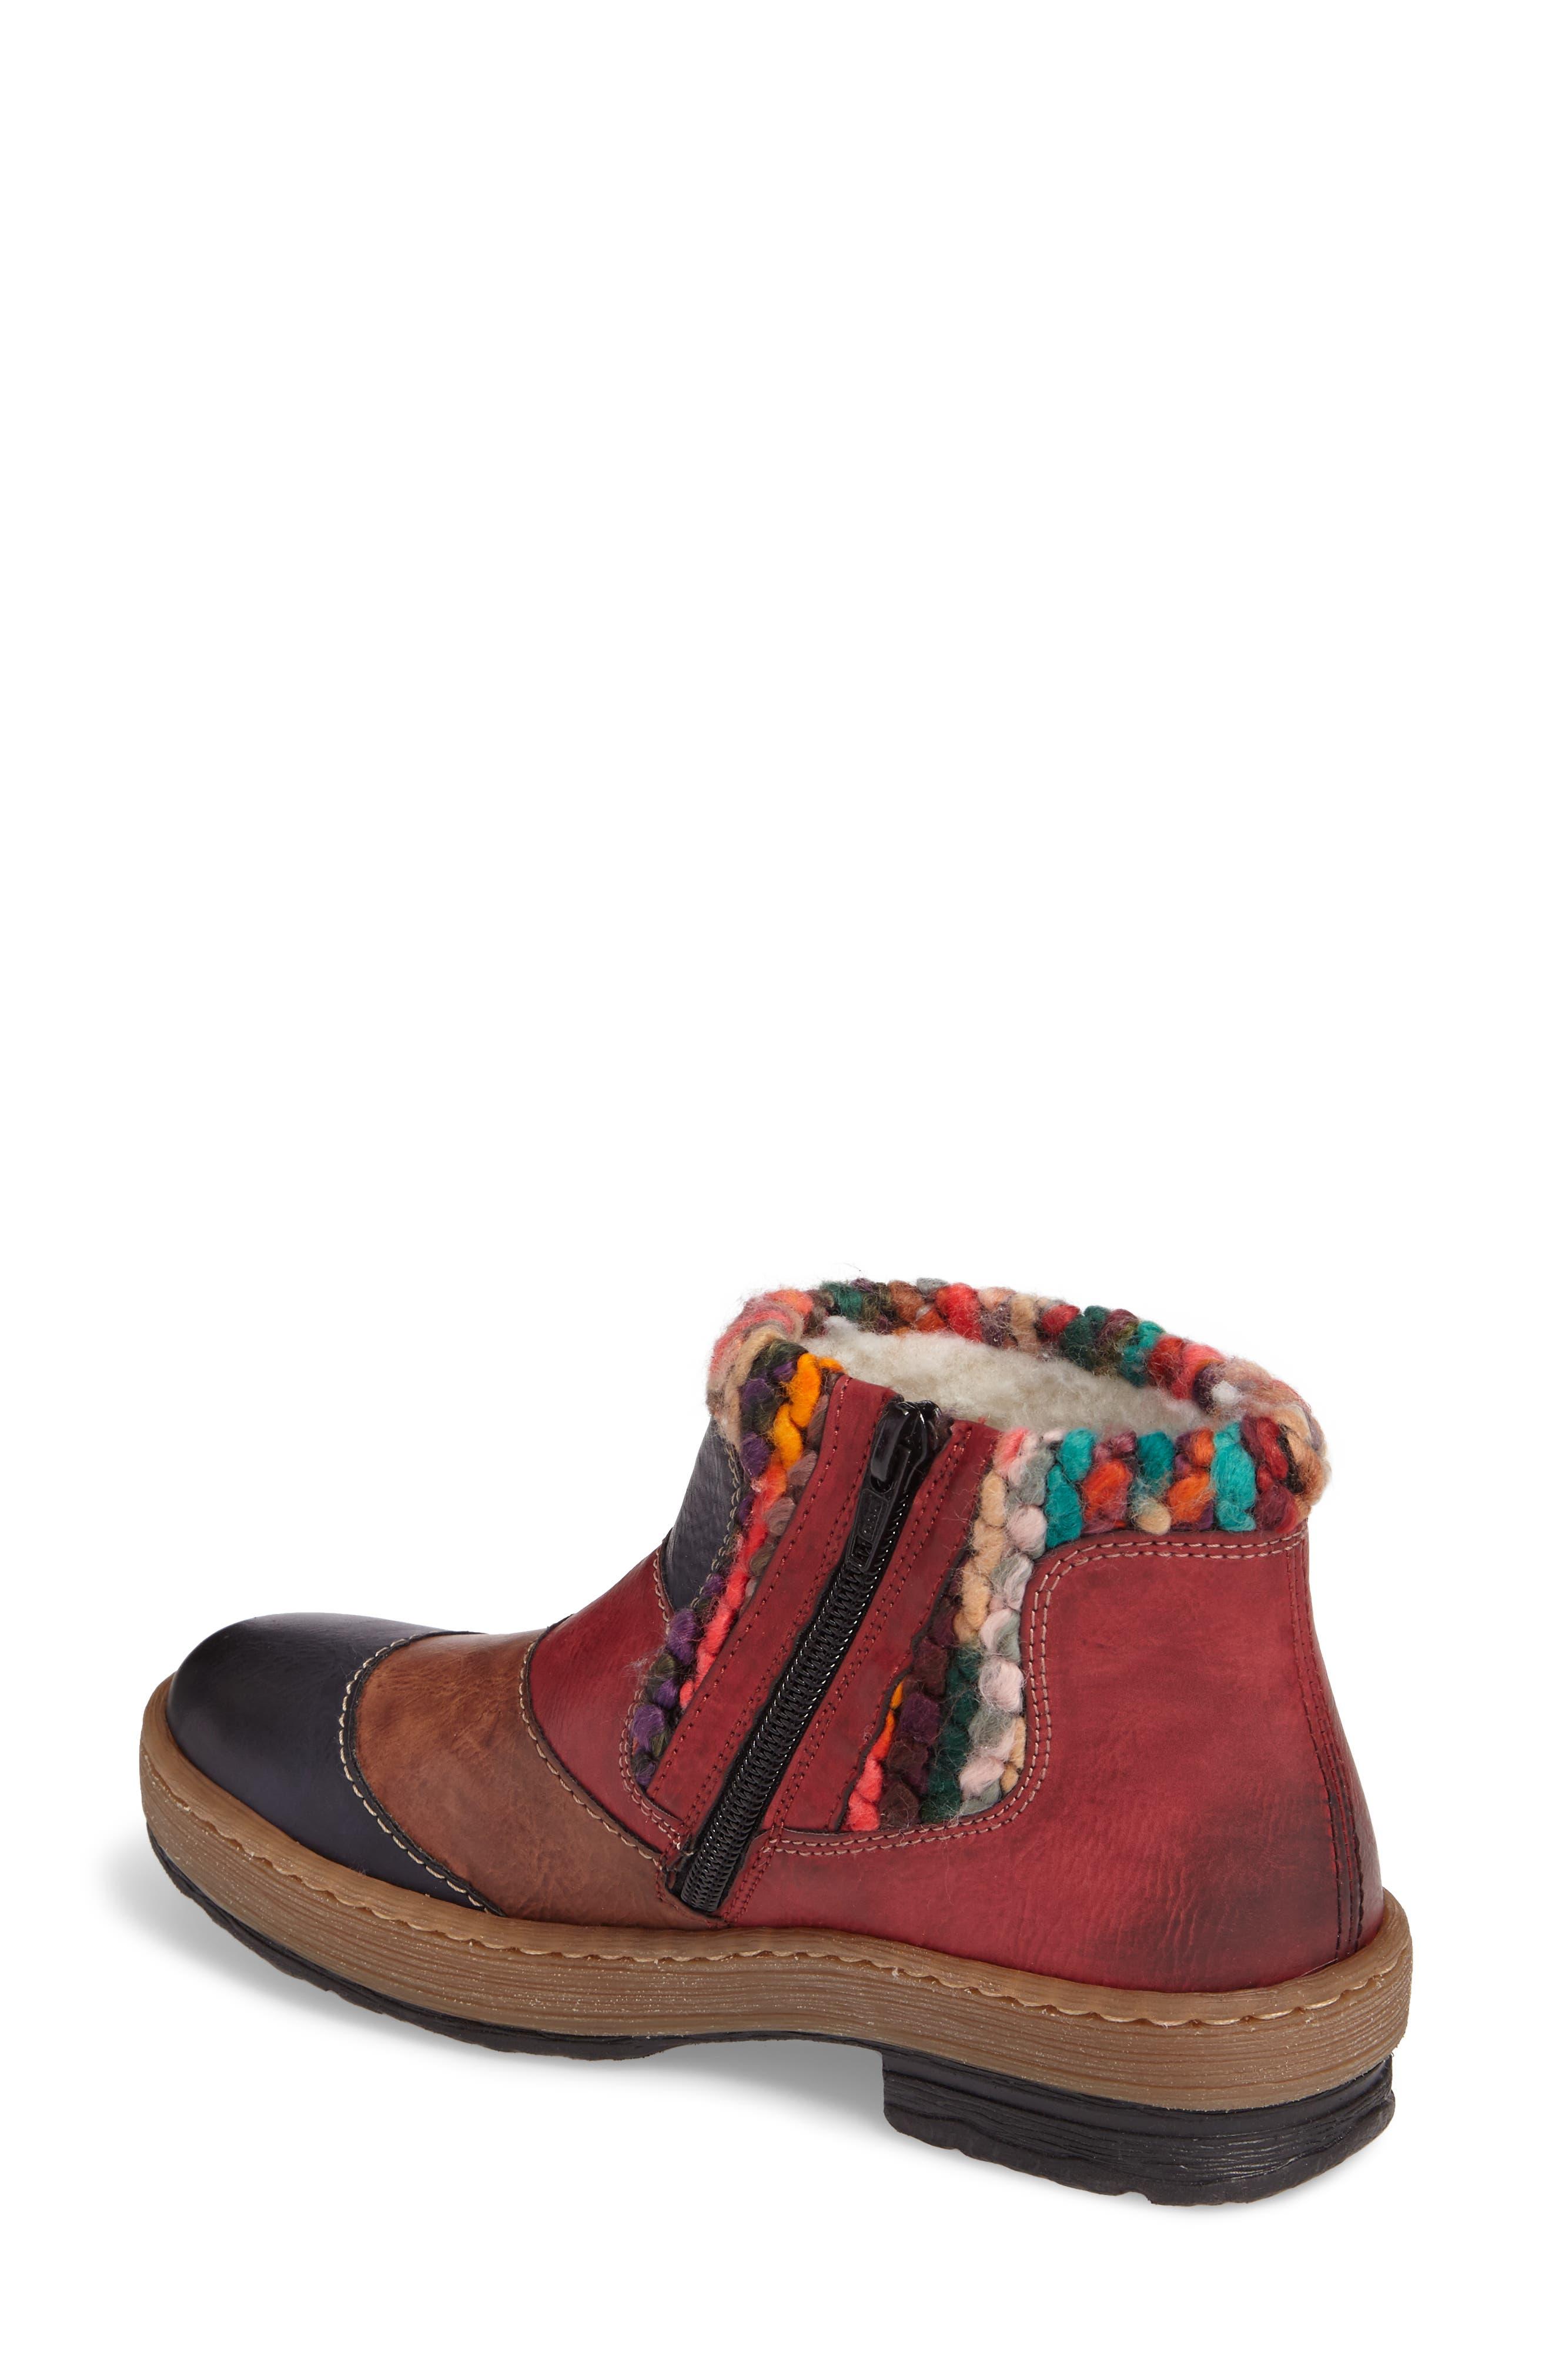 Felicitas 82 Boot,                             Alternate thumbnail 3, color,                             Ocean Multi Faux Leather